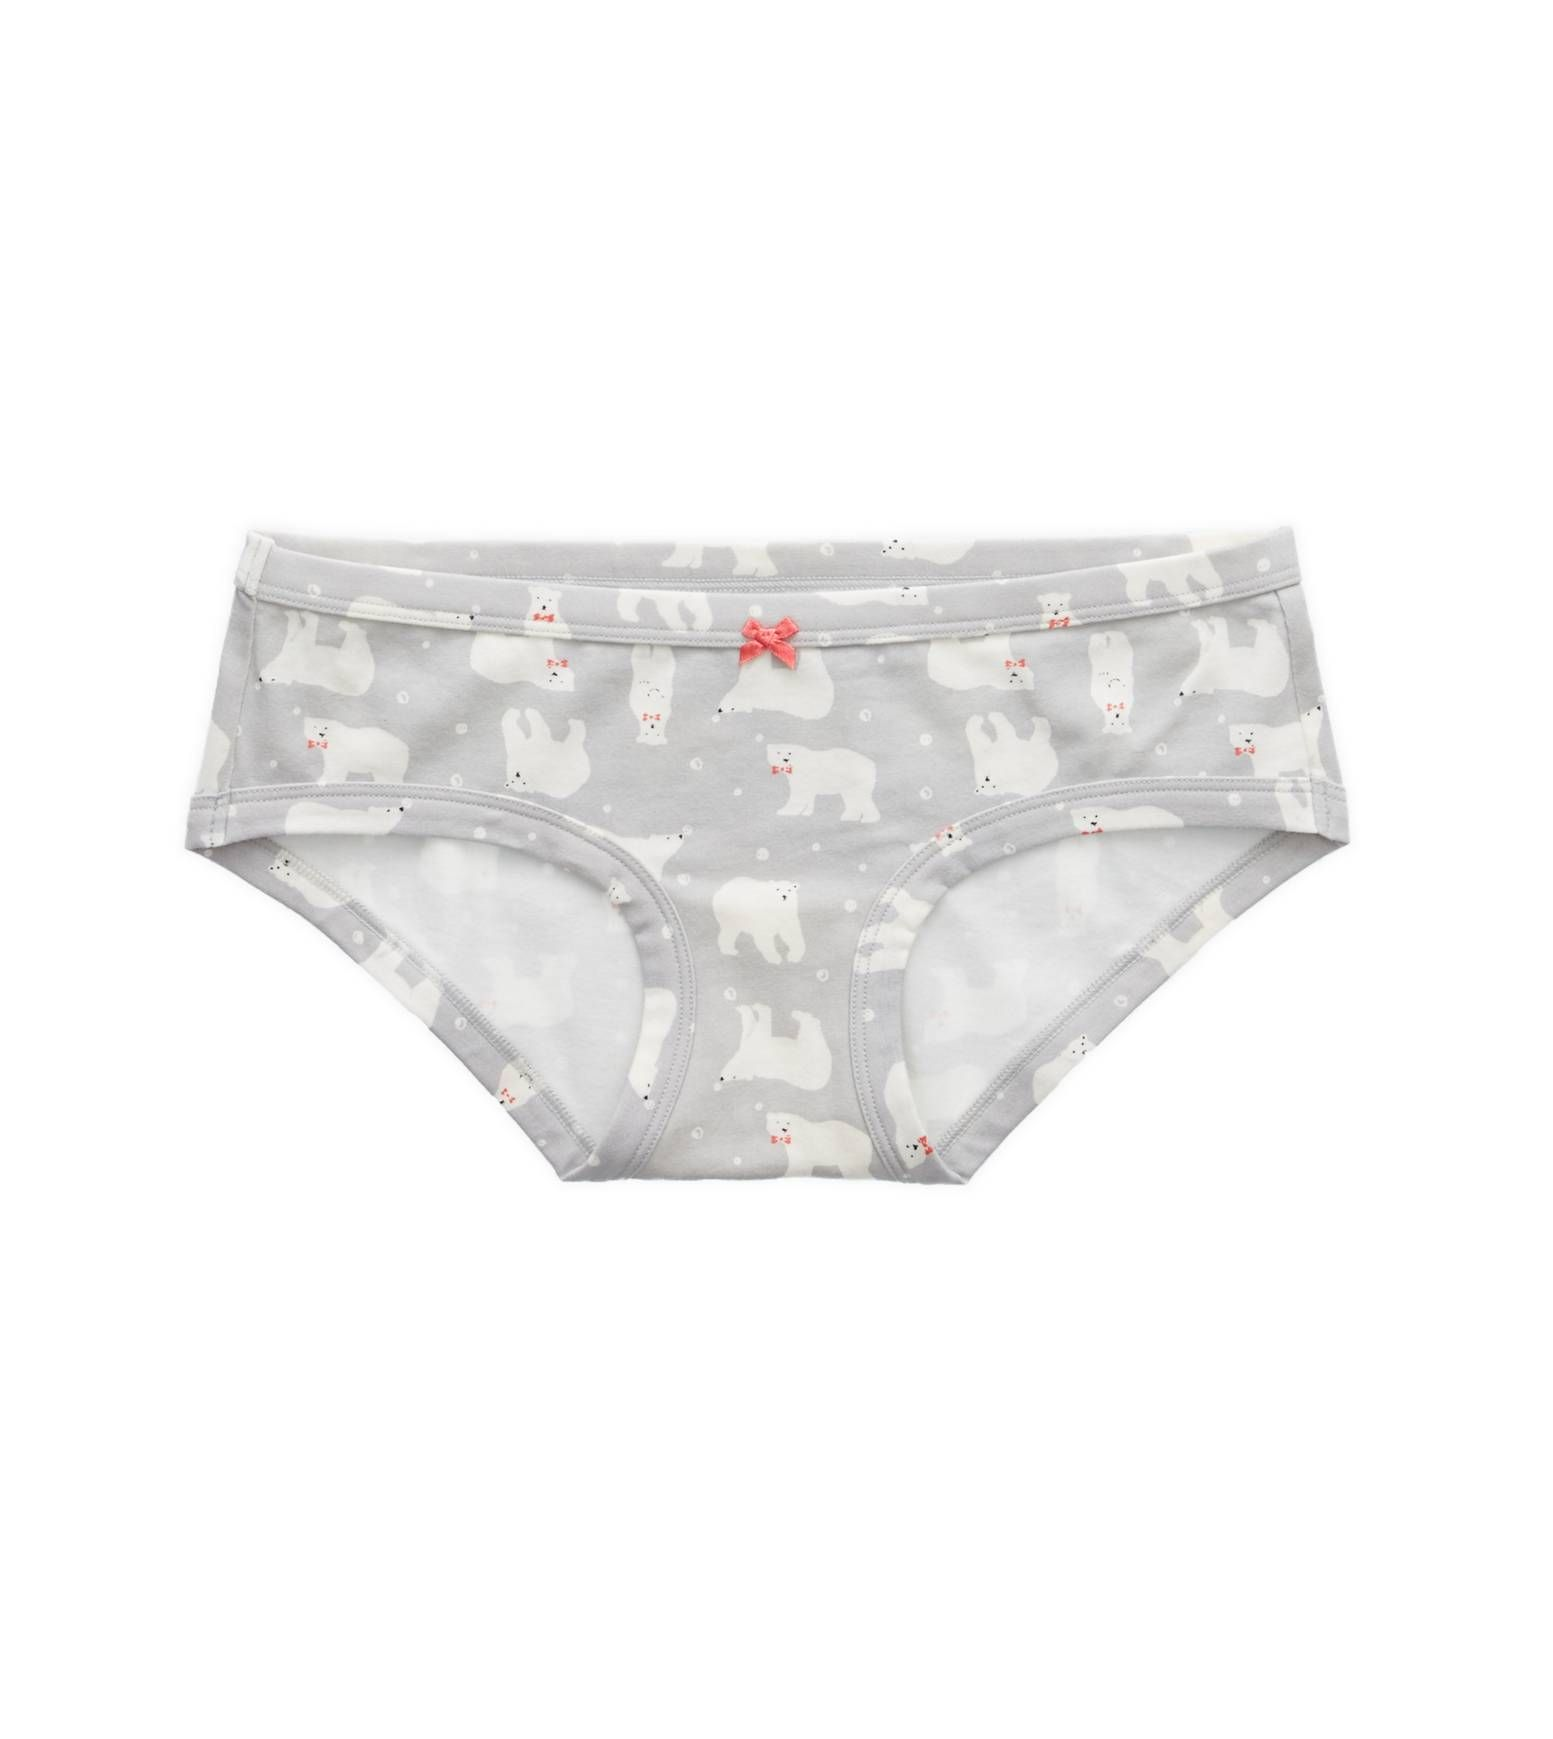 a2973195dcc Undies and Women s Underwear. Silver Steel Aerie Boybrief - Better than the  boys !  Aerie